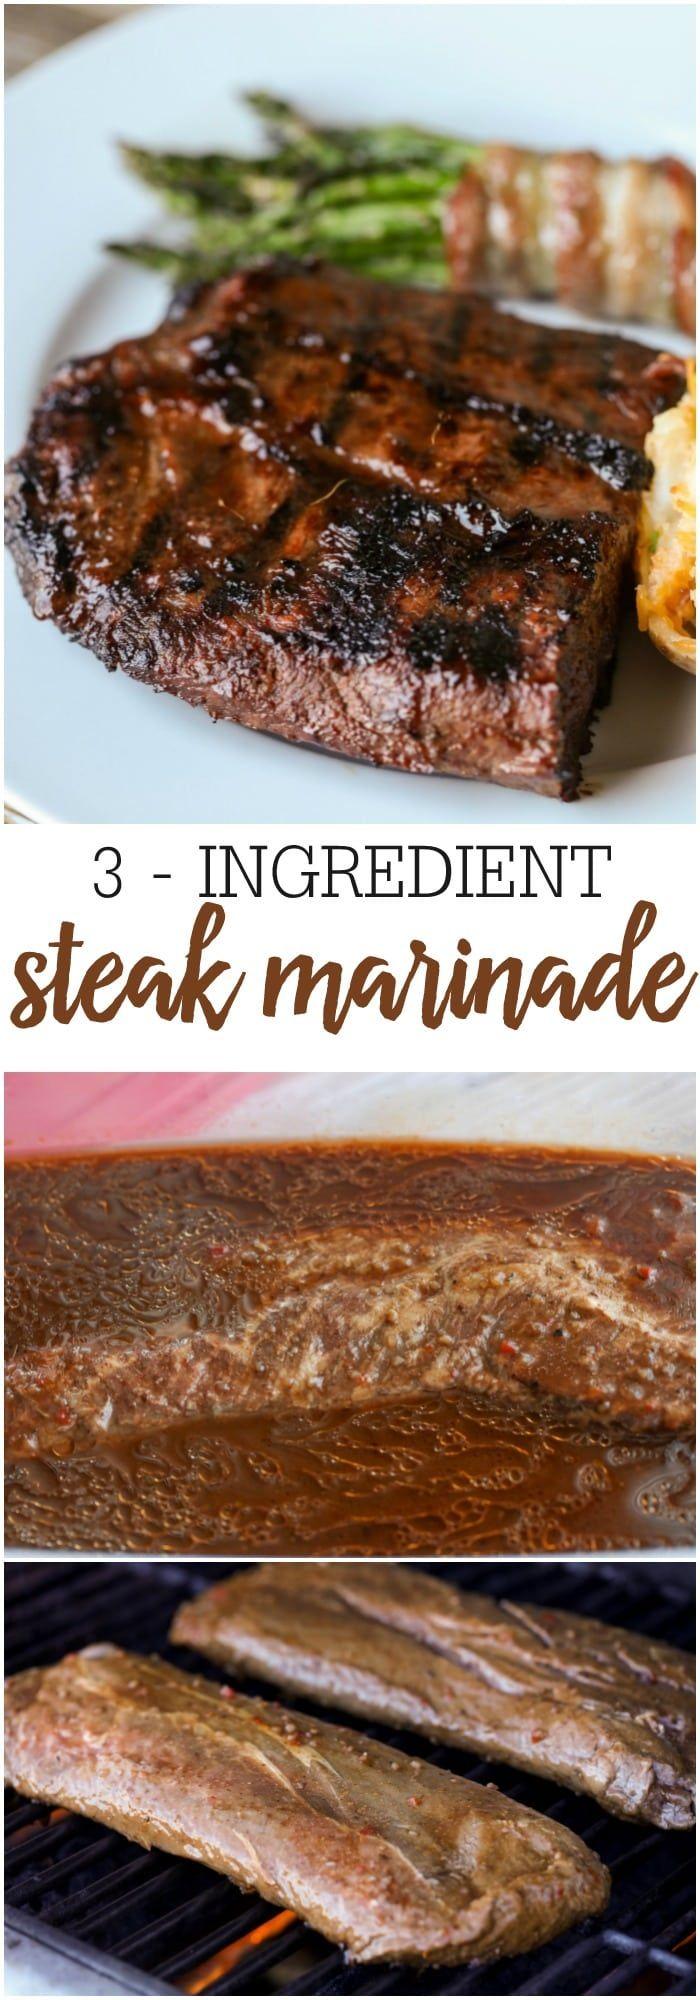 Easy 3-Ingredient Steak Marinade Recipe | Lil' Luna